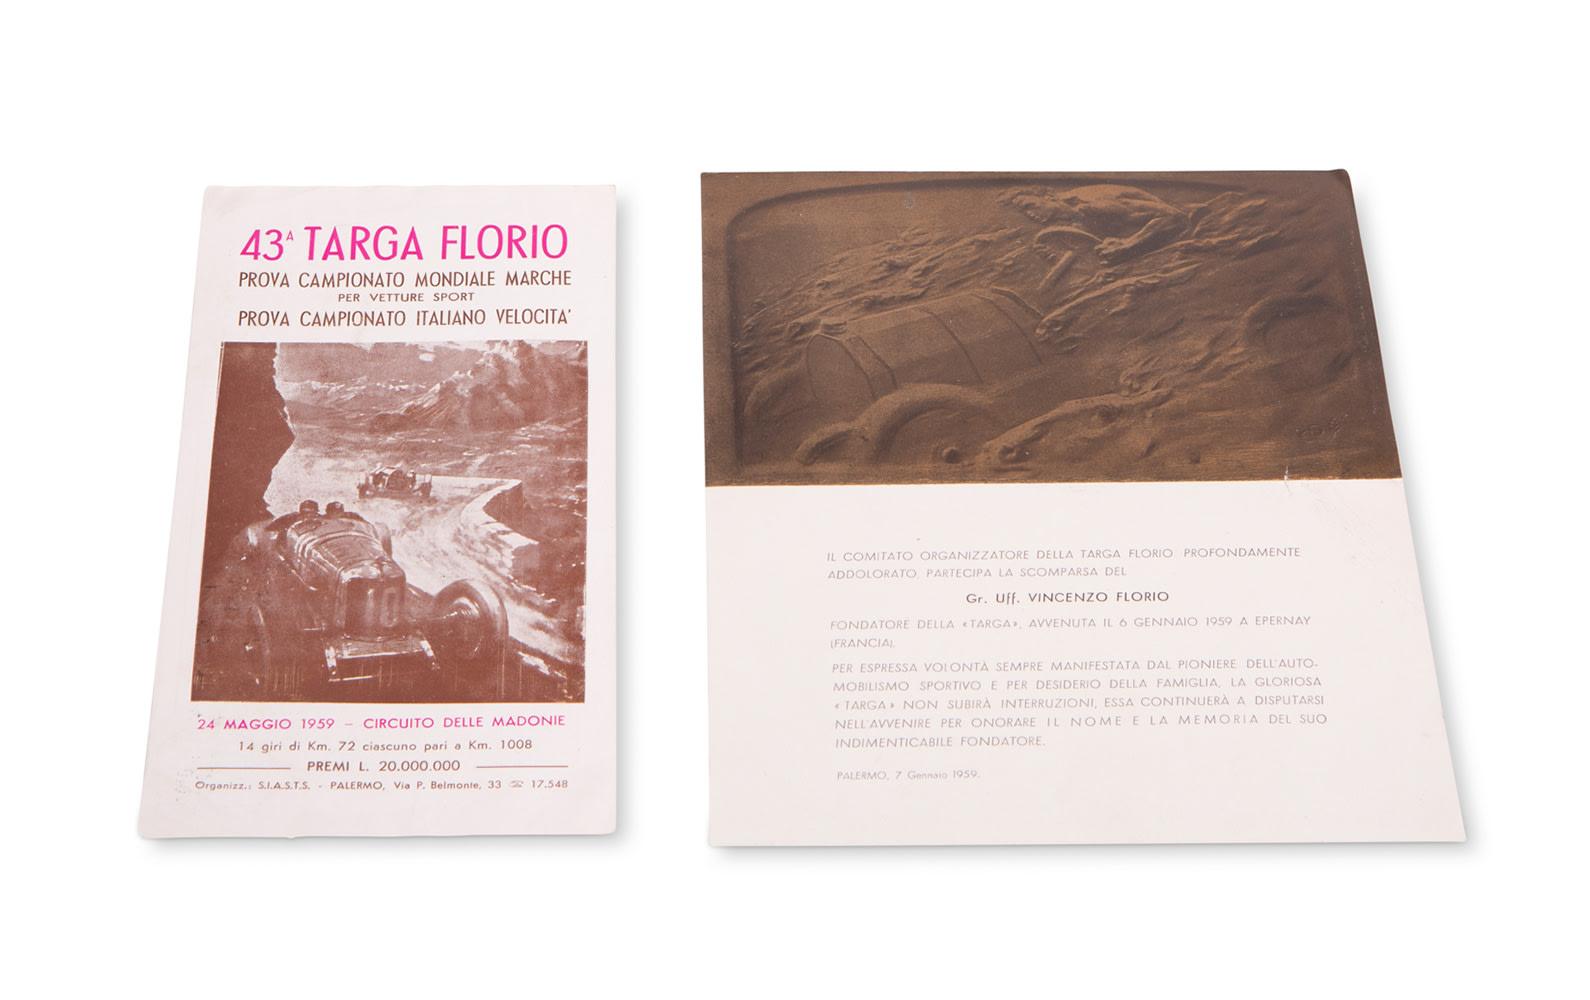 1959 Targa Florio Promotional Materials